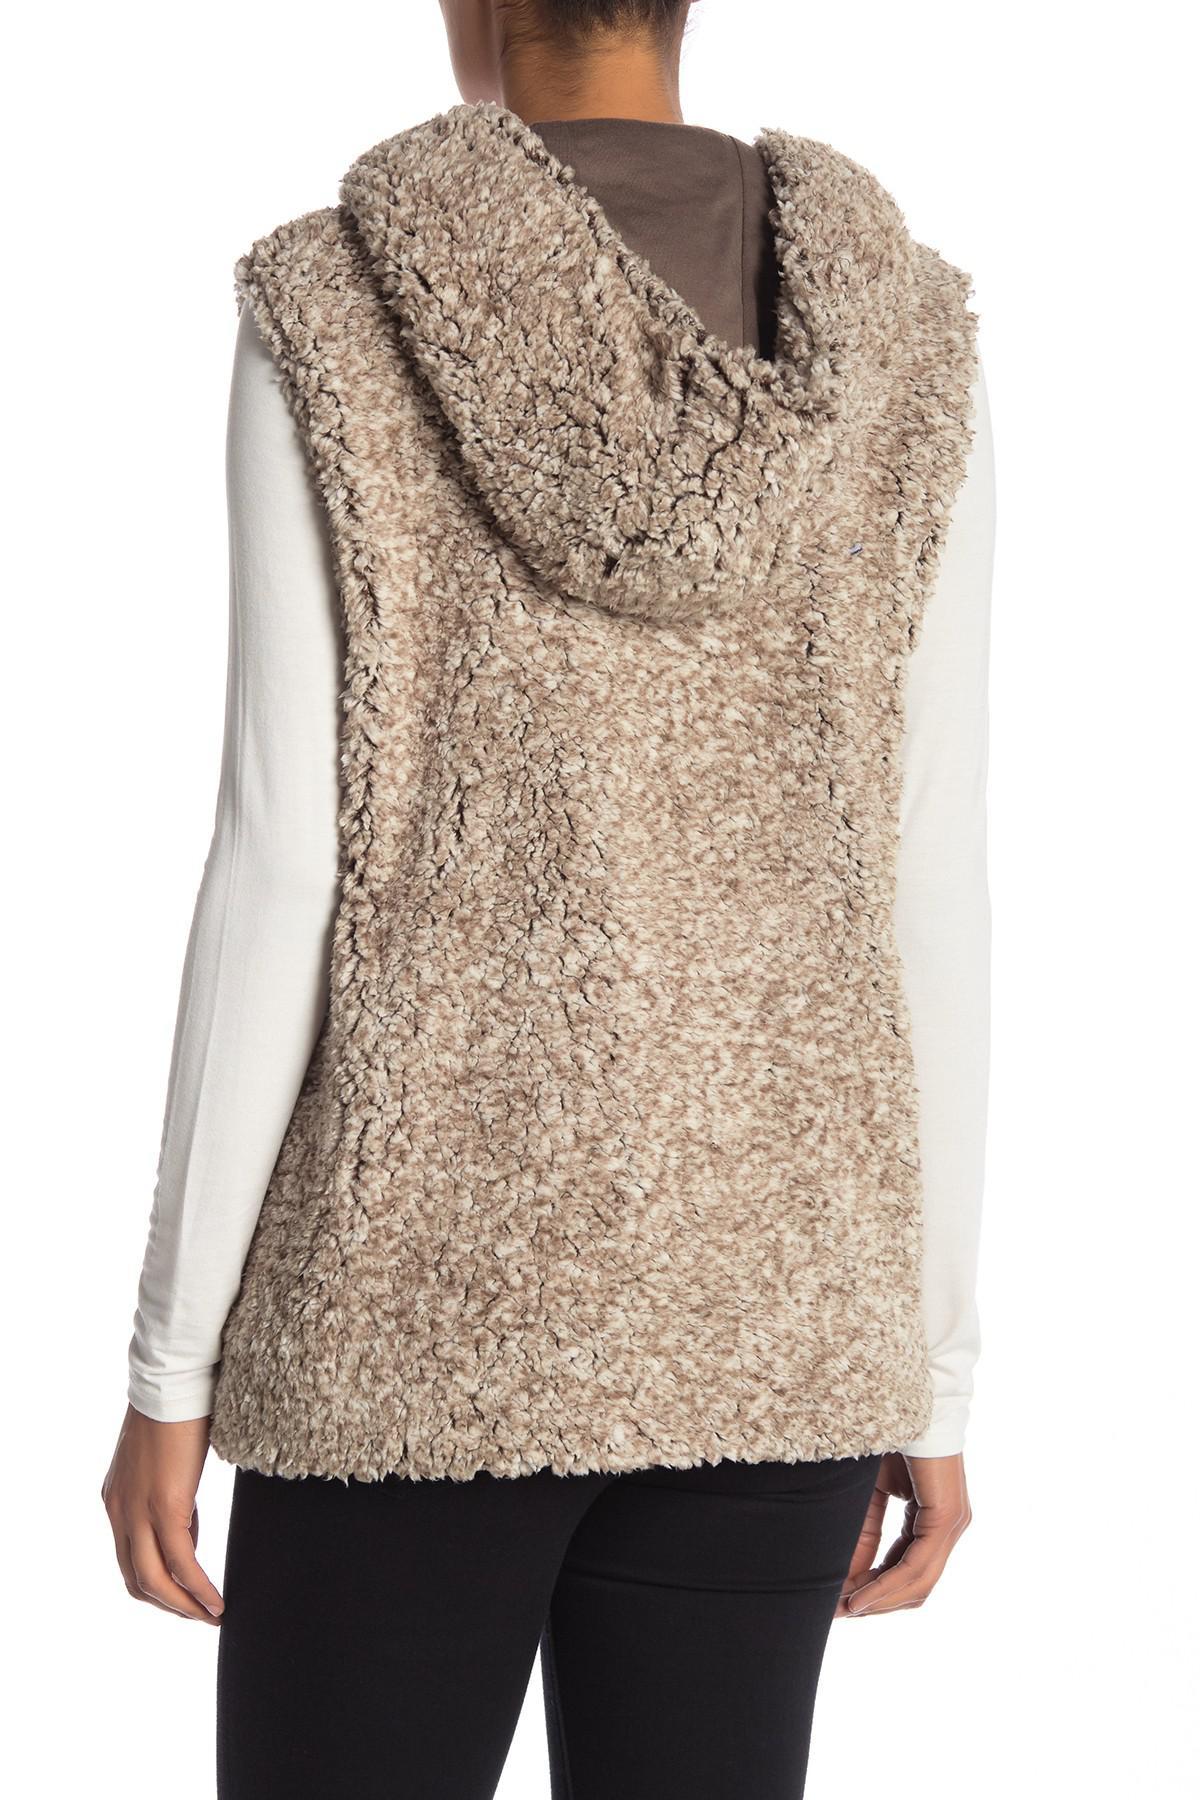 8c56530cefe5 Lyst - CoffeeShop Whubby Hooded Faux Fur Vest in Brown